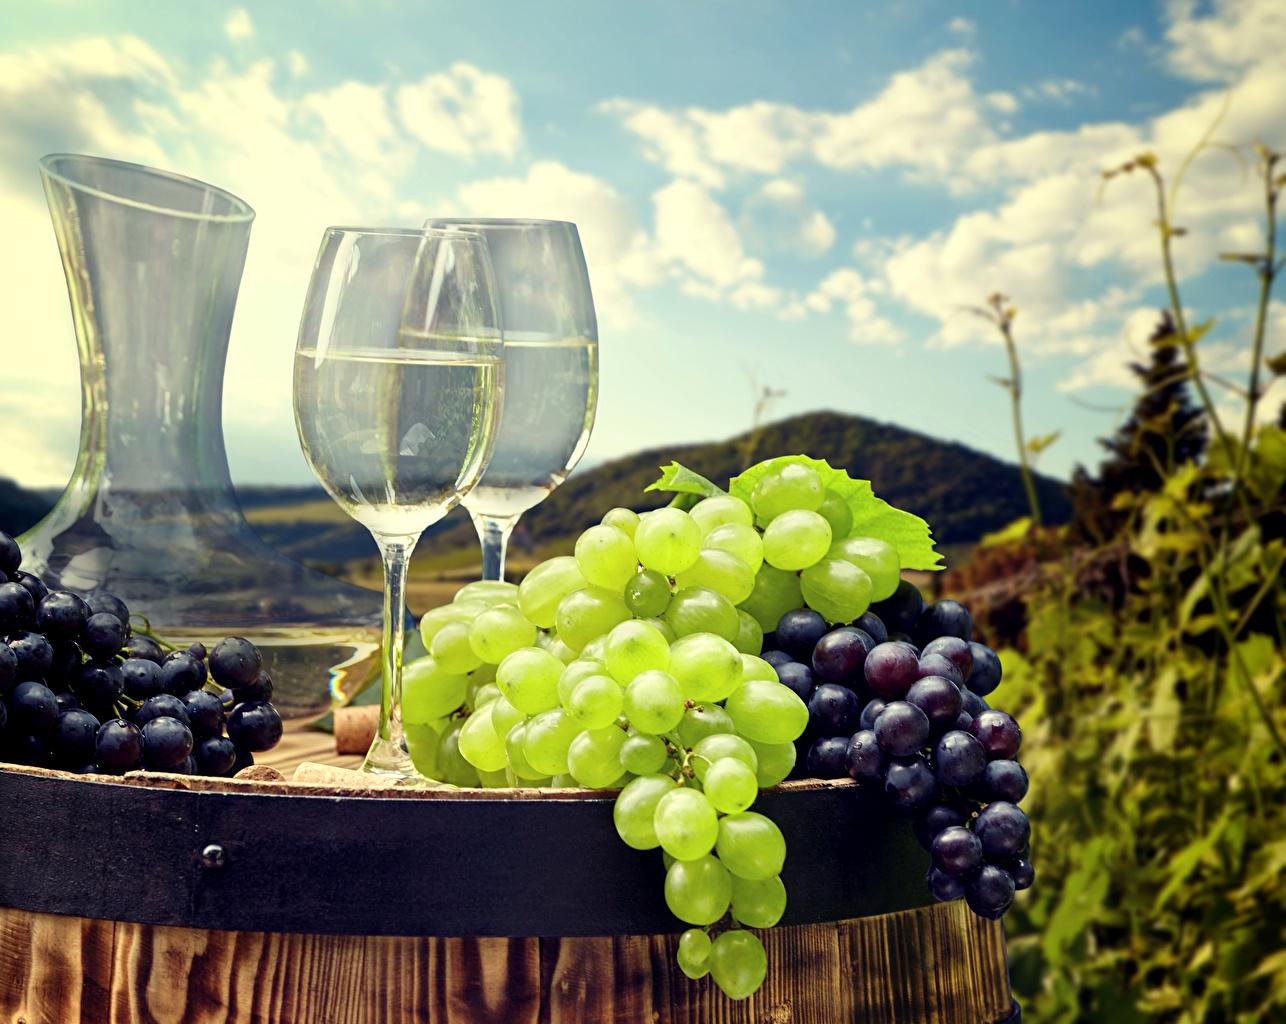 Картинка Вино Бочка Виноград Пища Бокалы Еда бокал Продукты питания